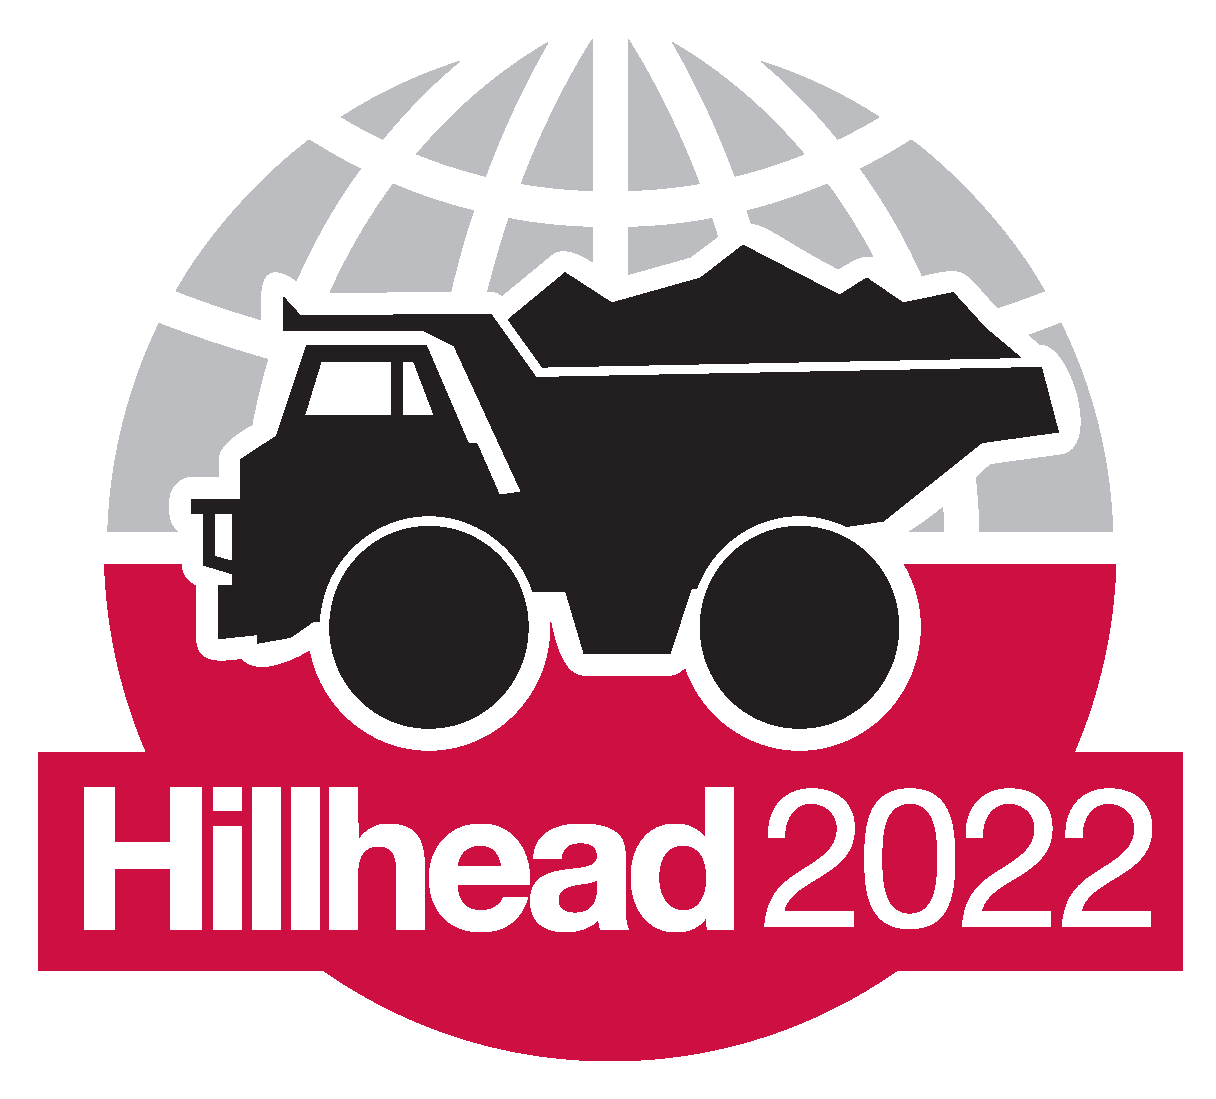 Hillhead2022 Logo - Upcoming Events